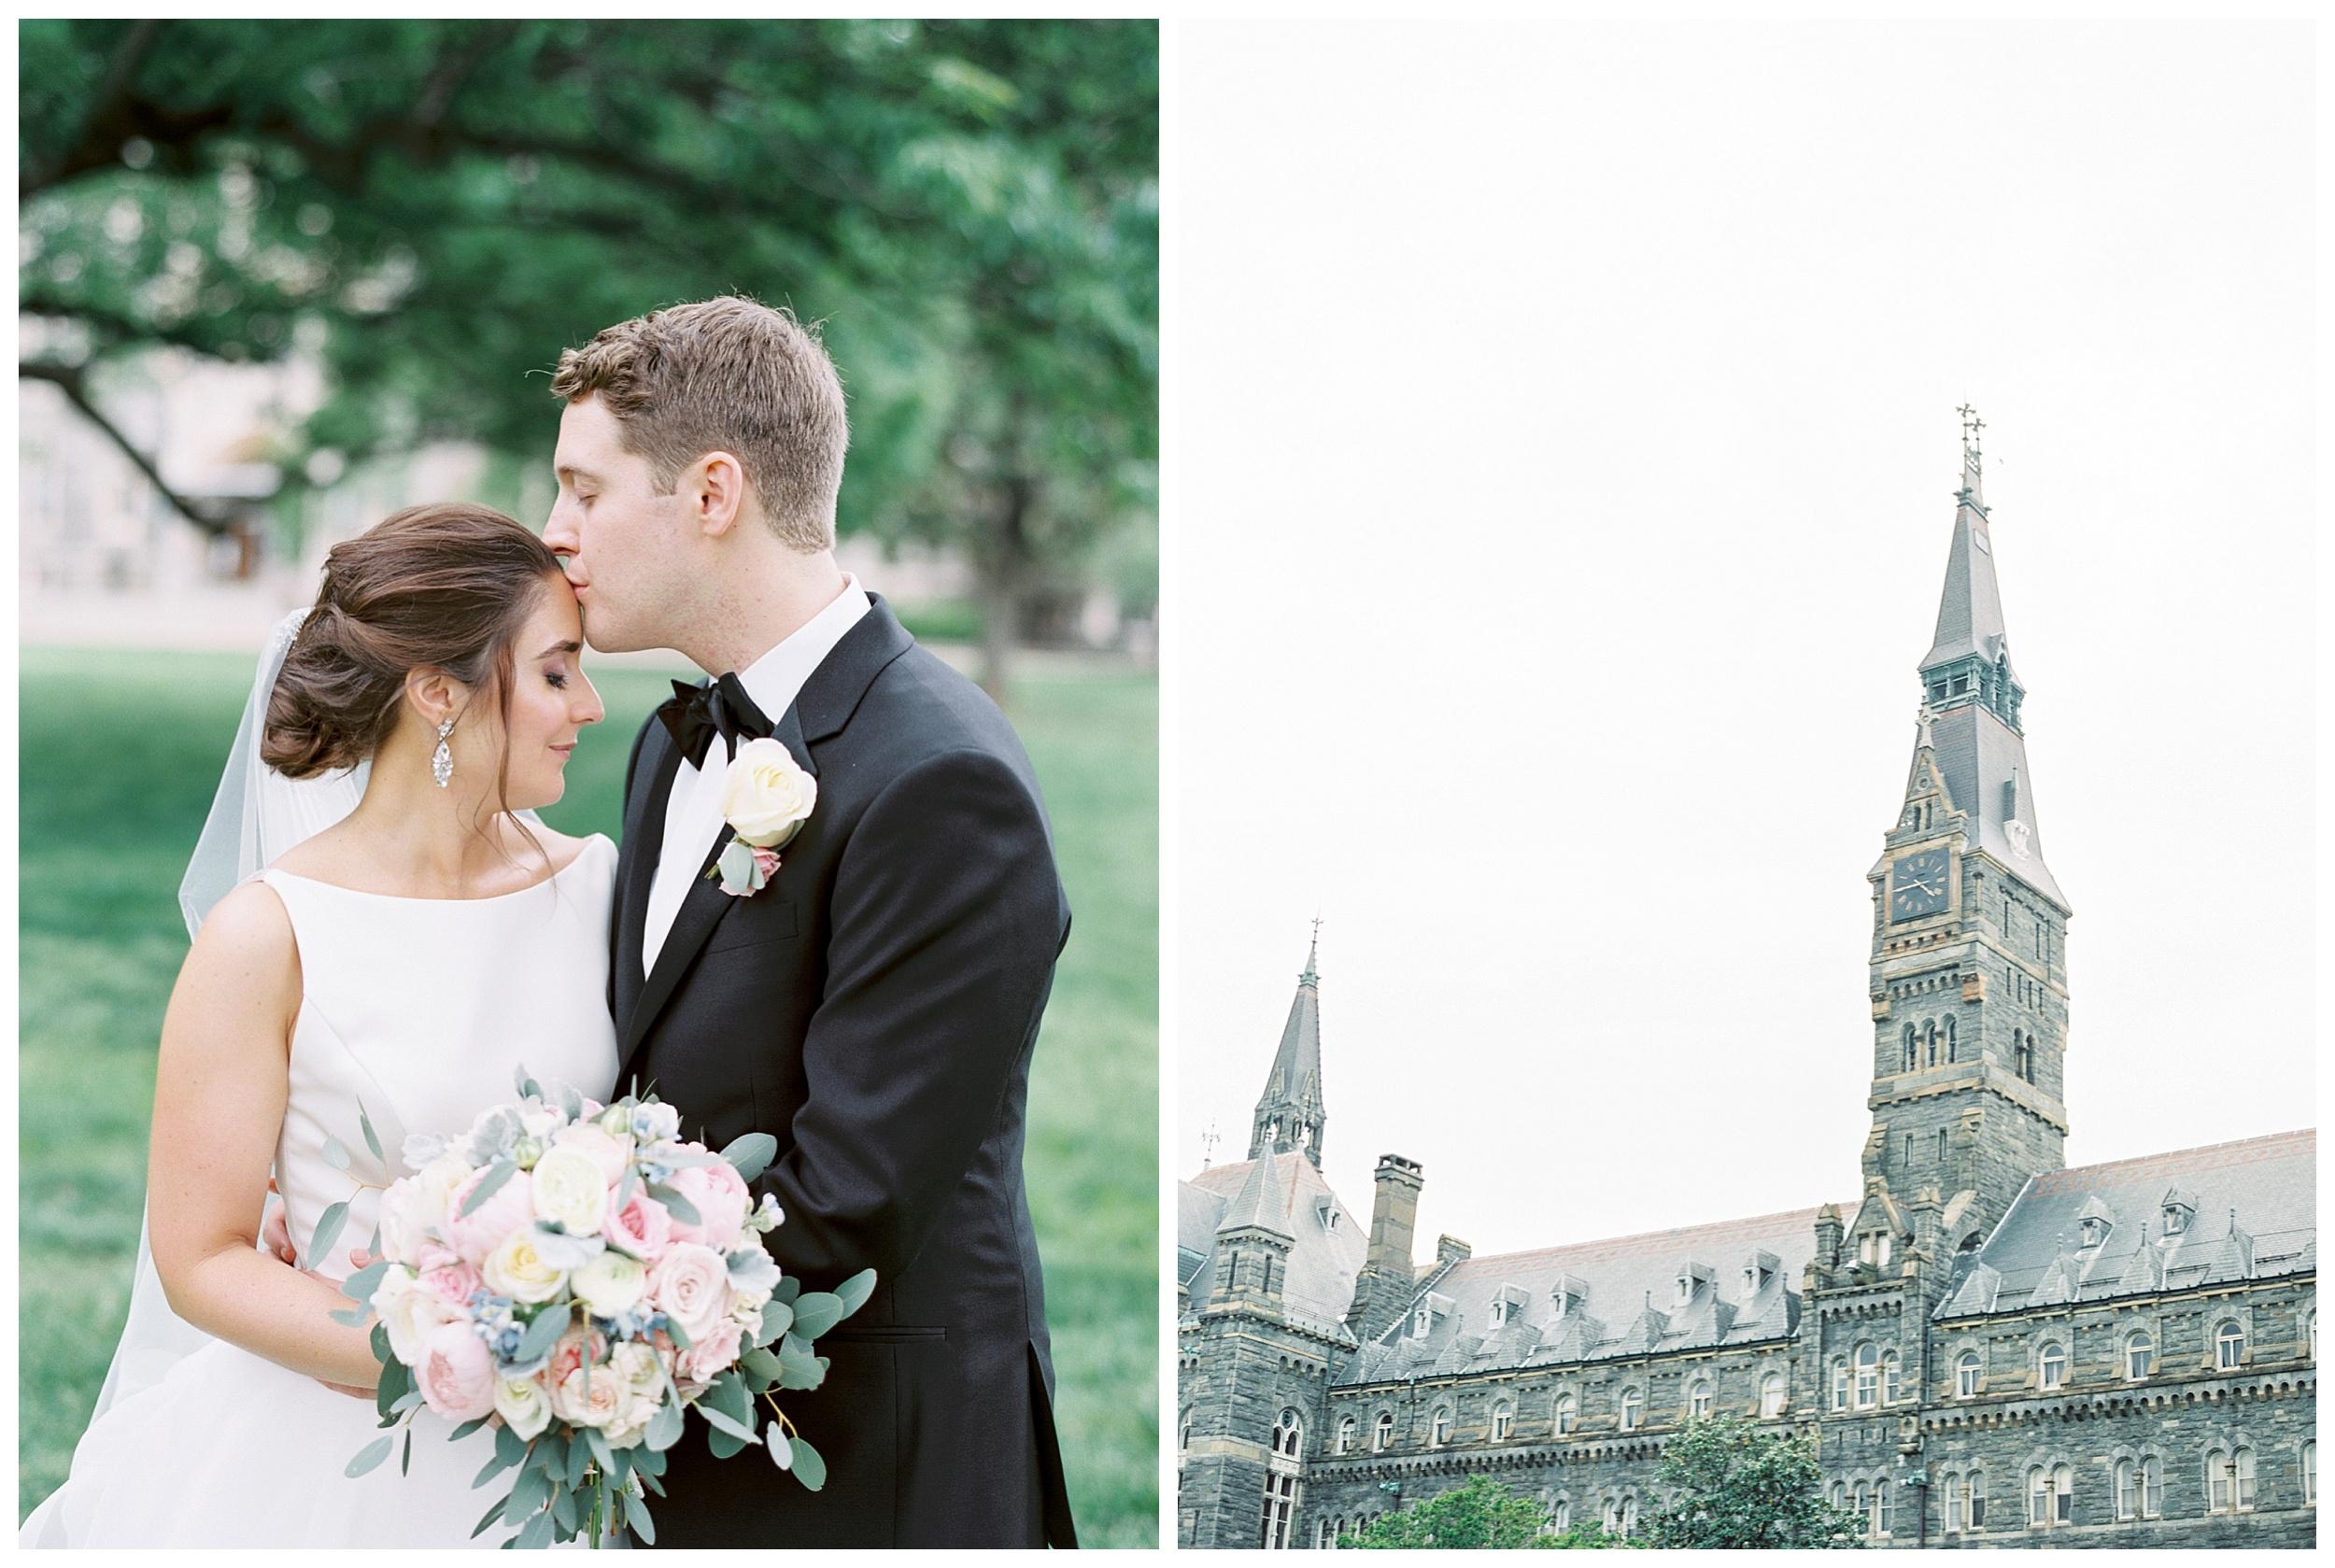 DAR Constitution Hall Wedding Wedding | Daughters of the American Revolution Wedding | District of Columbia Film Wedding Photographer Kir Tuben_0059.jpg